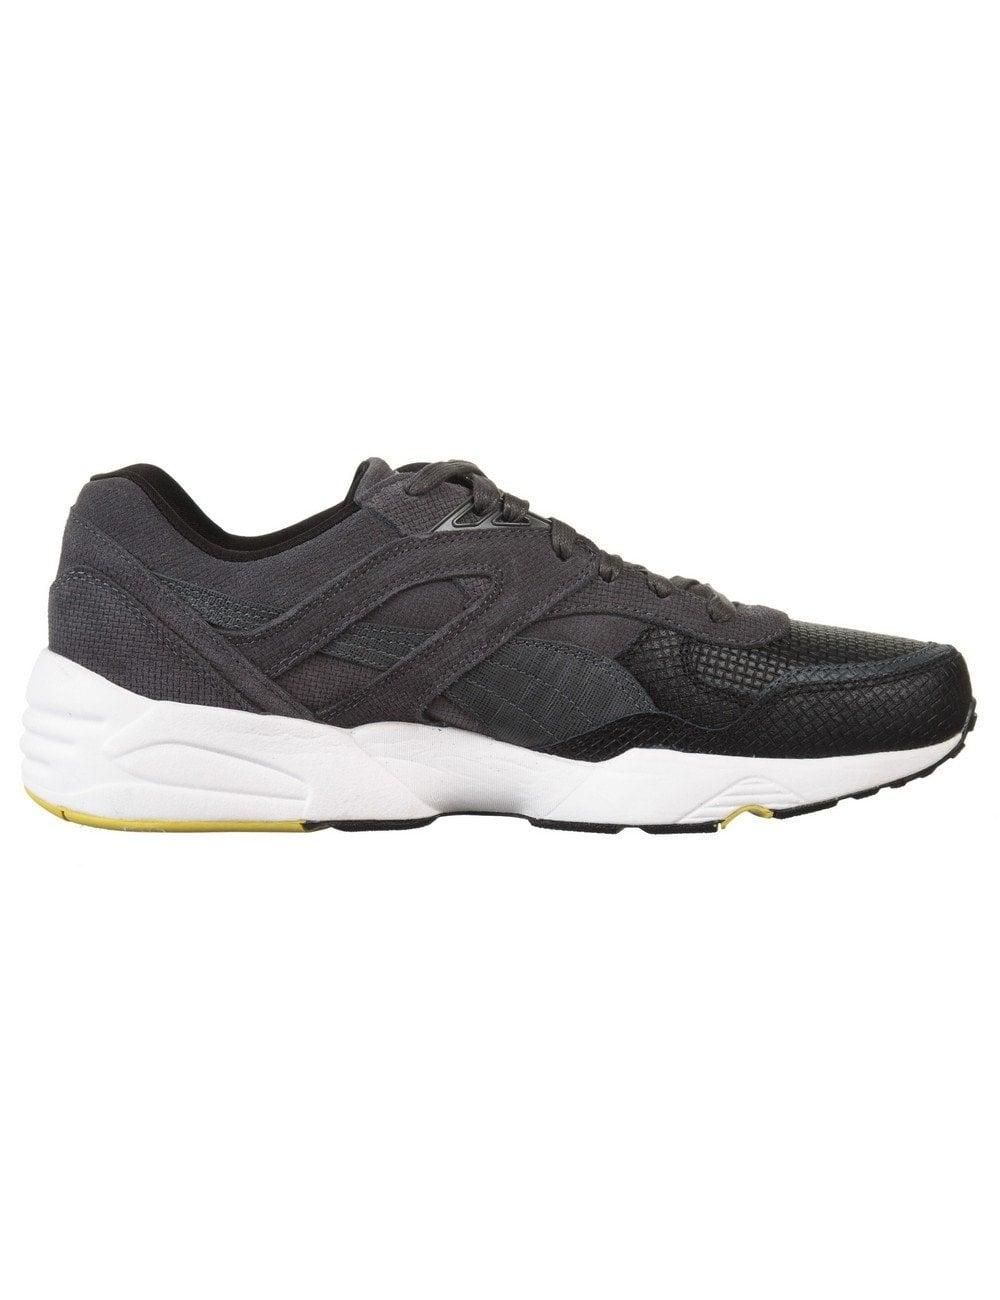 puma r698 q4 v2 shoes